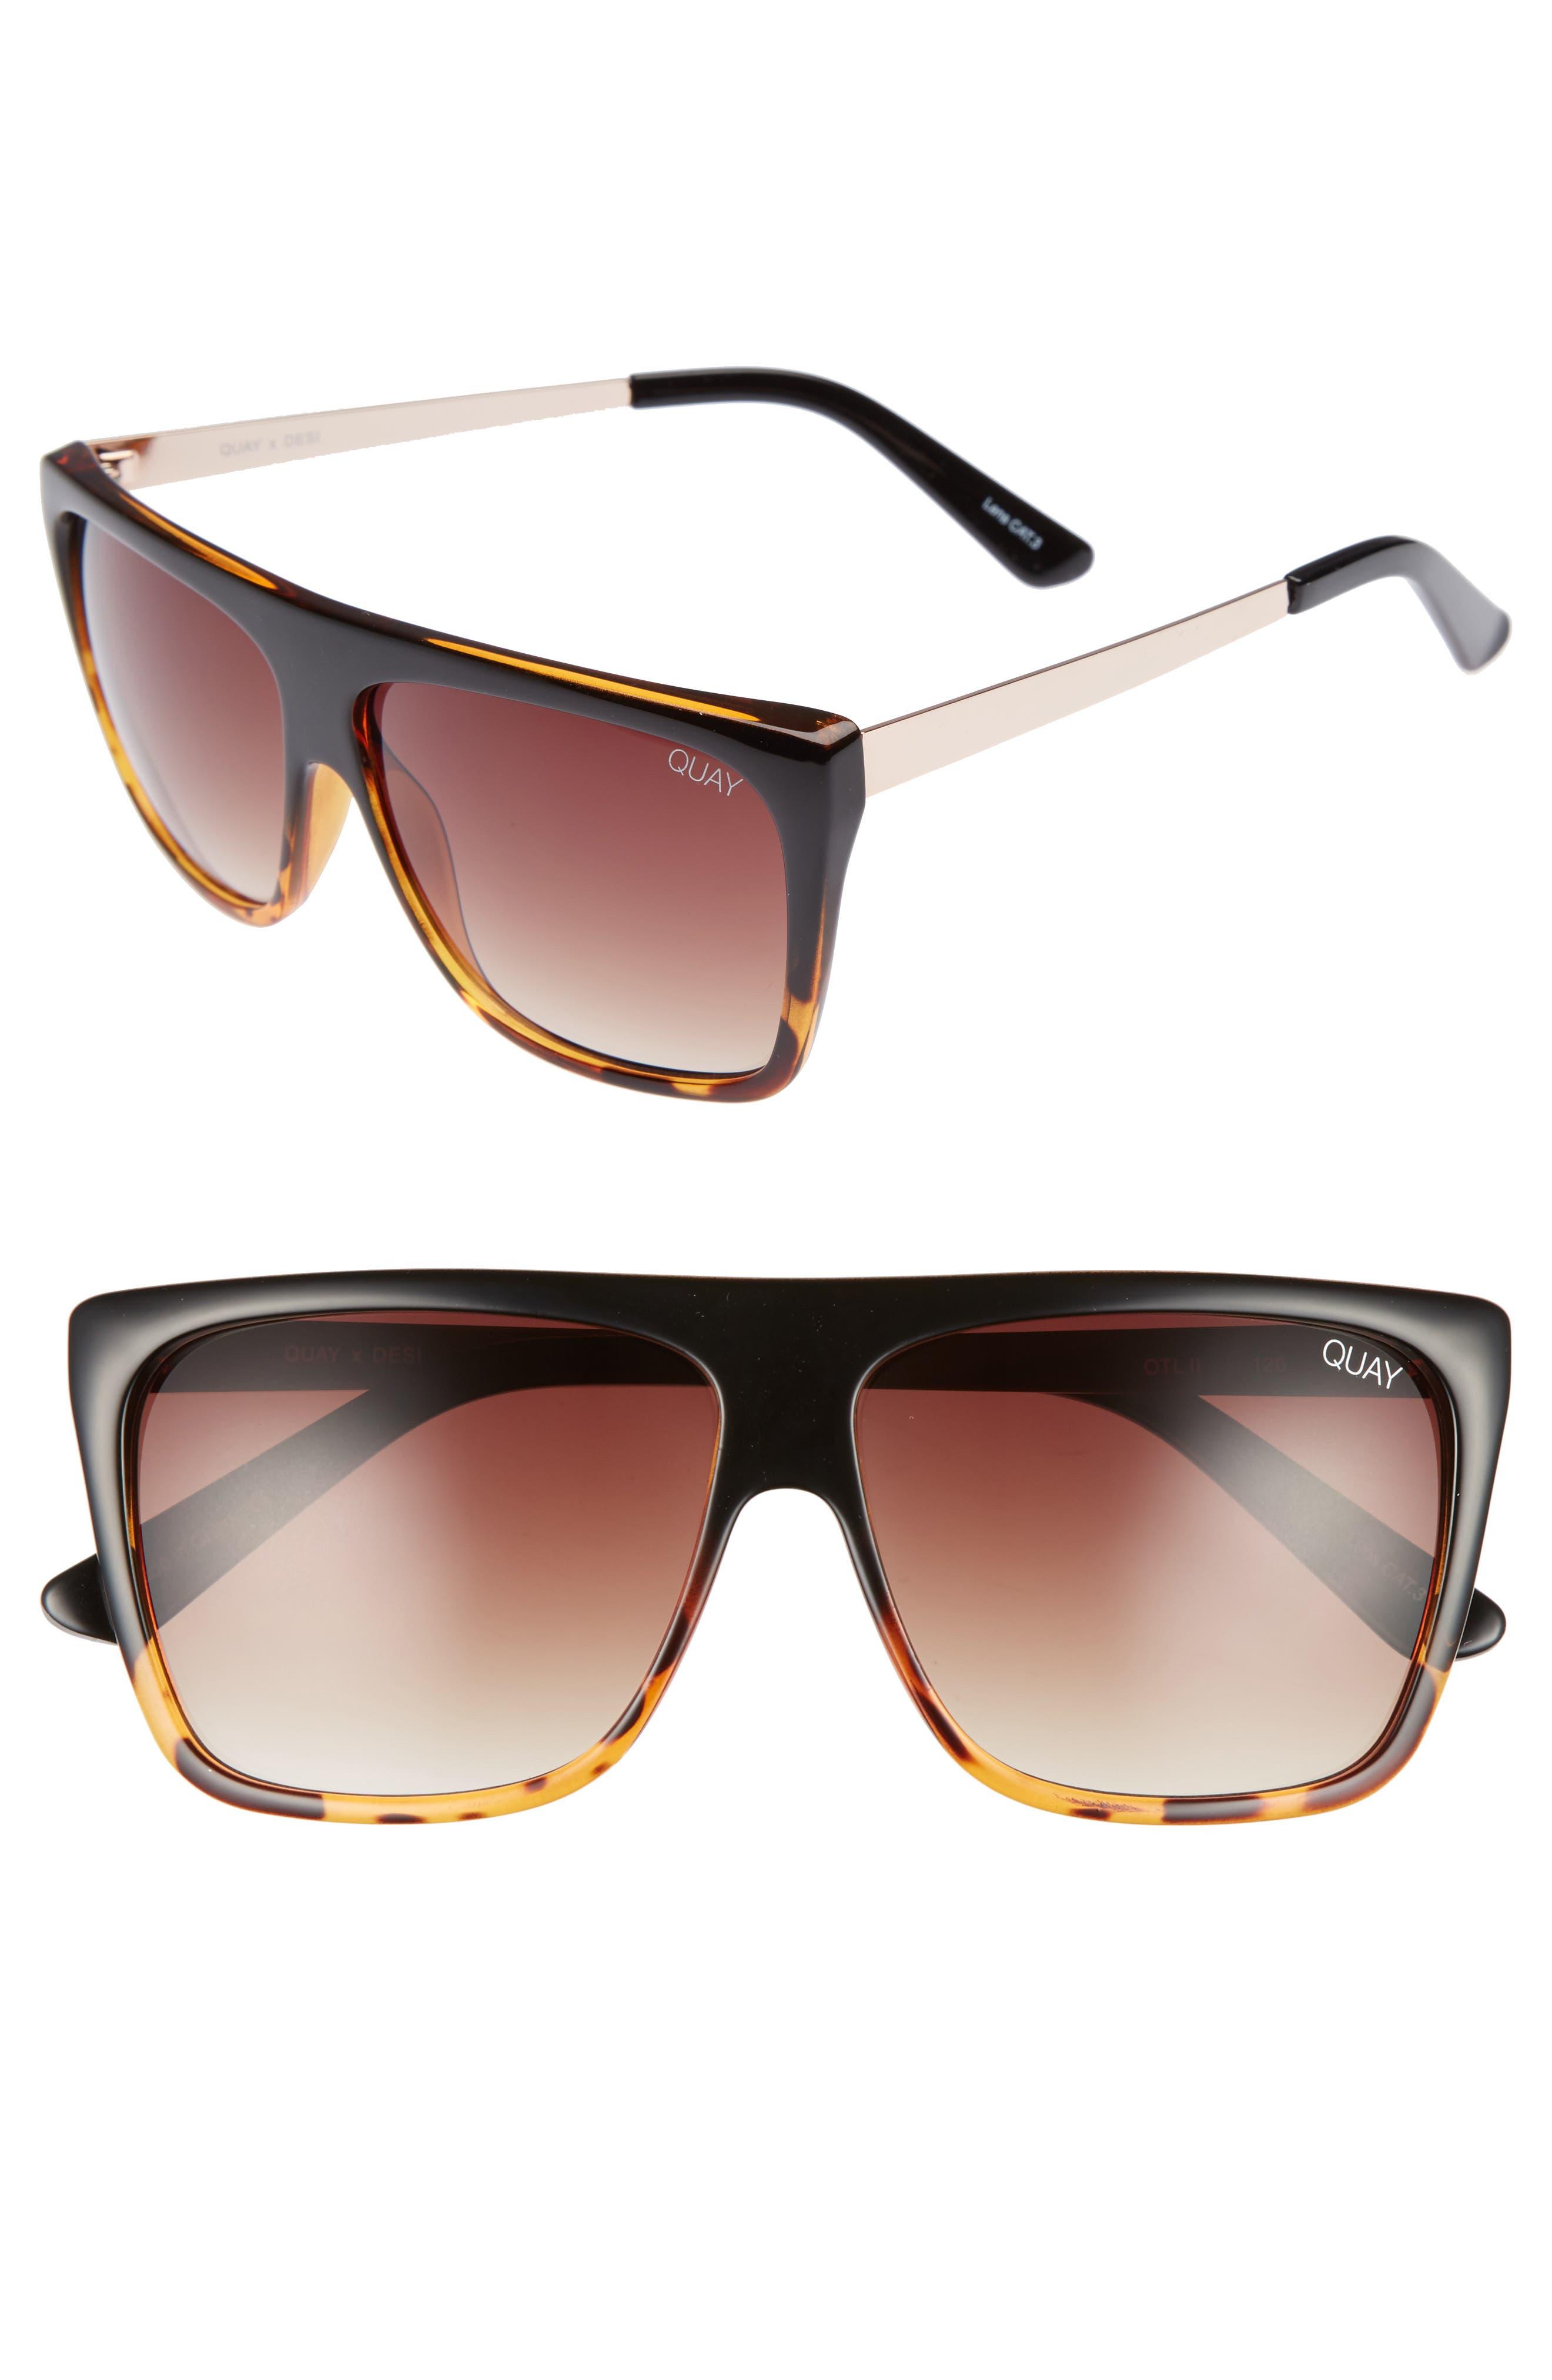 Quay Australia X Desi Perkins On The Low 60Mm Square Sunglasses - Tort/ Brown